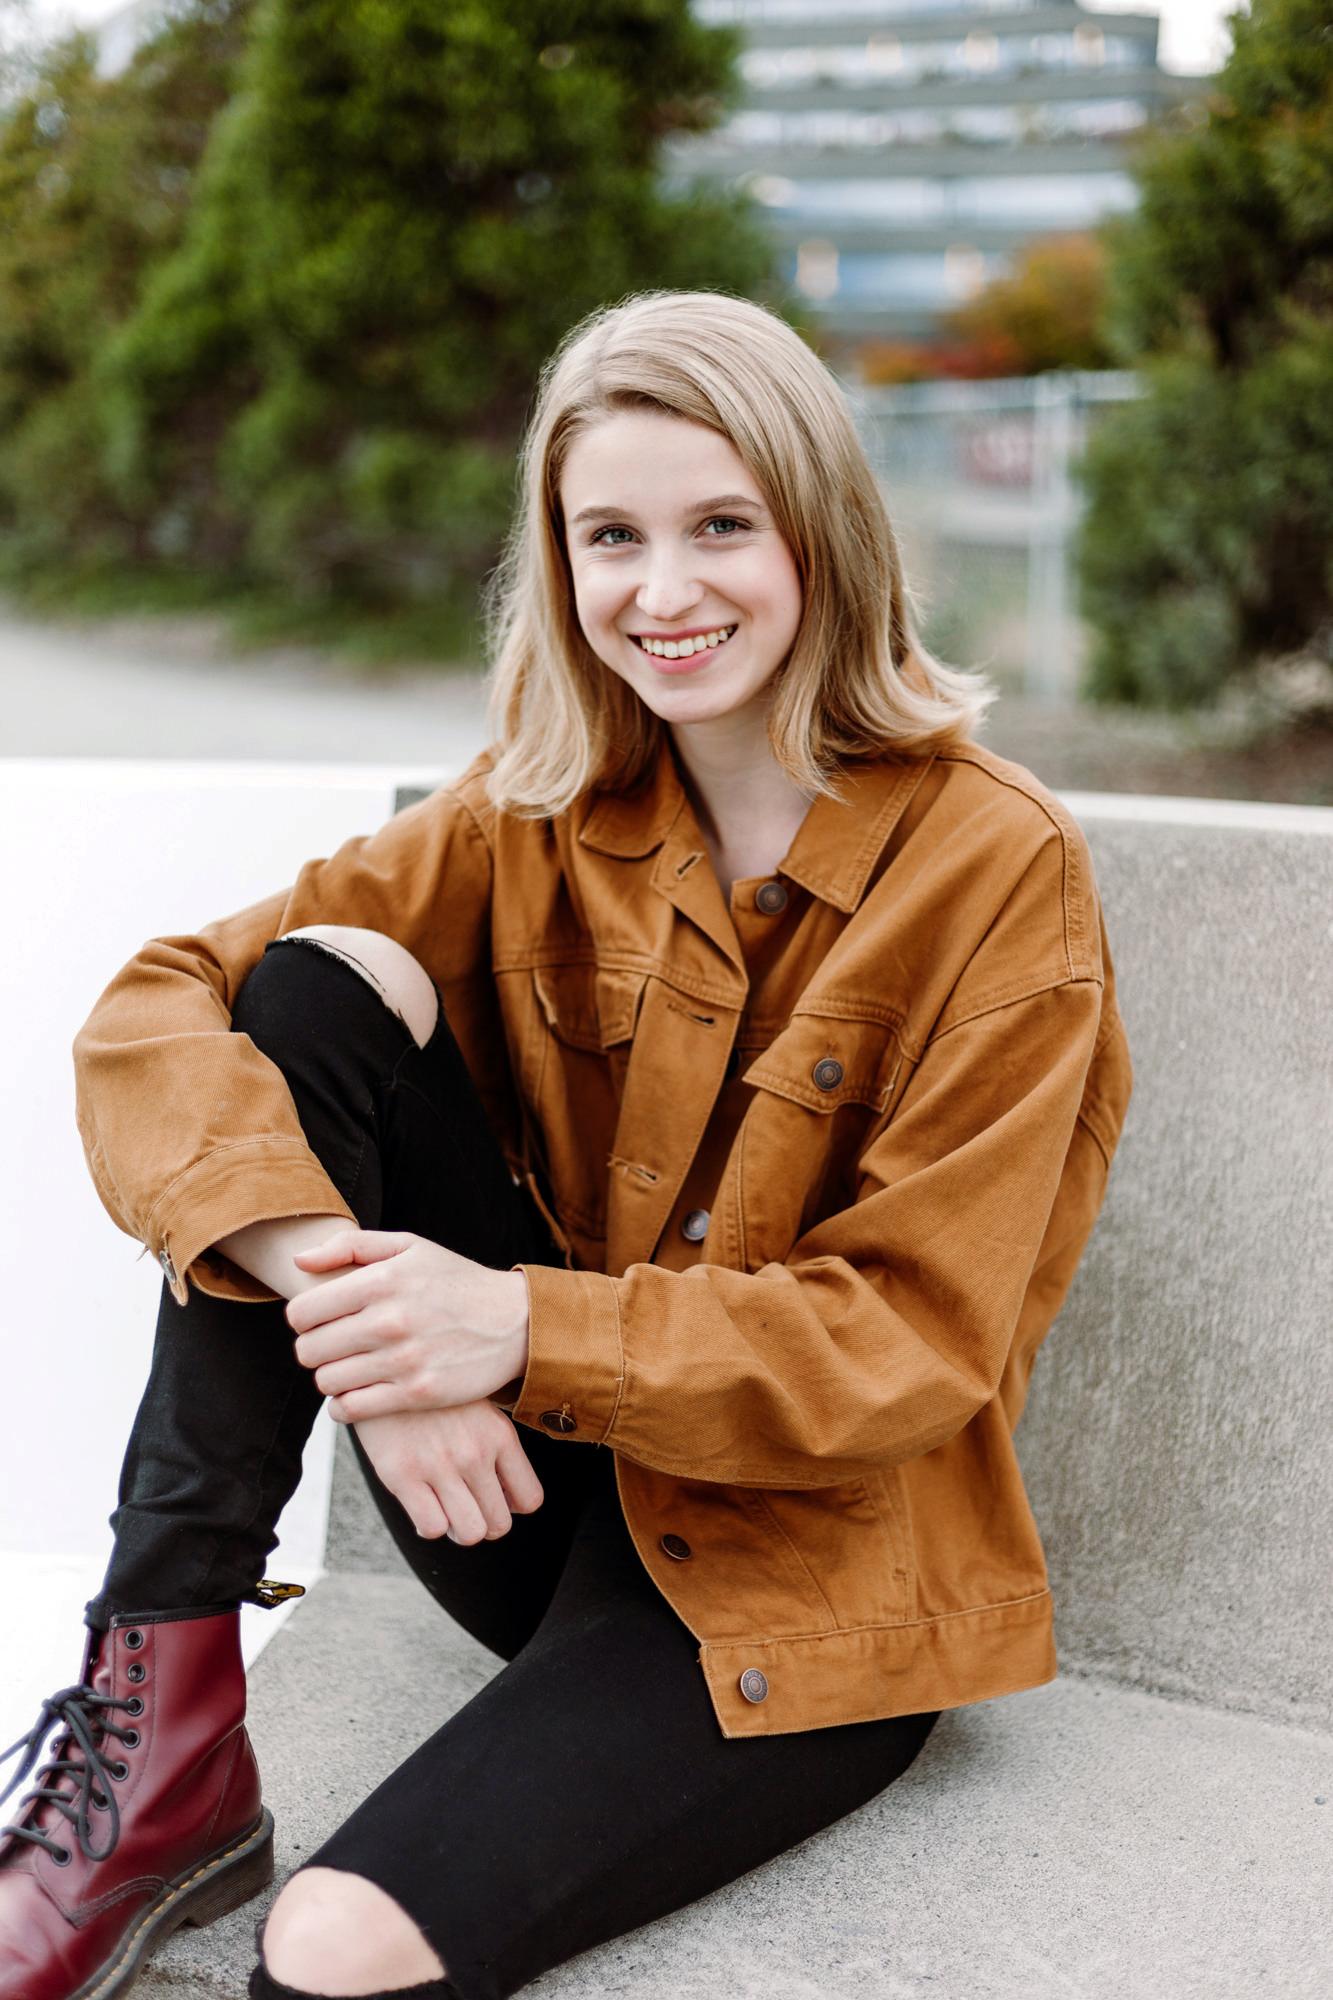 LaurenSenior-HaleyMcLain8.JPG